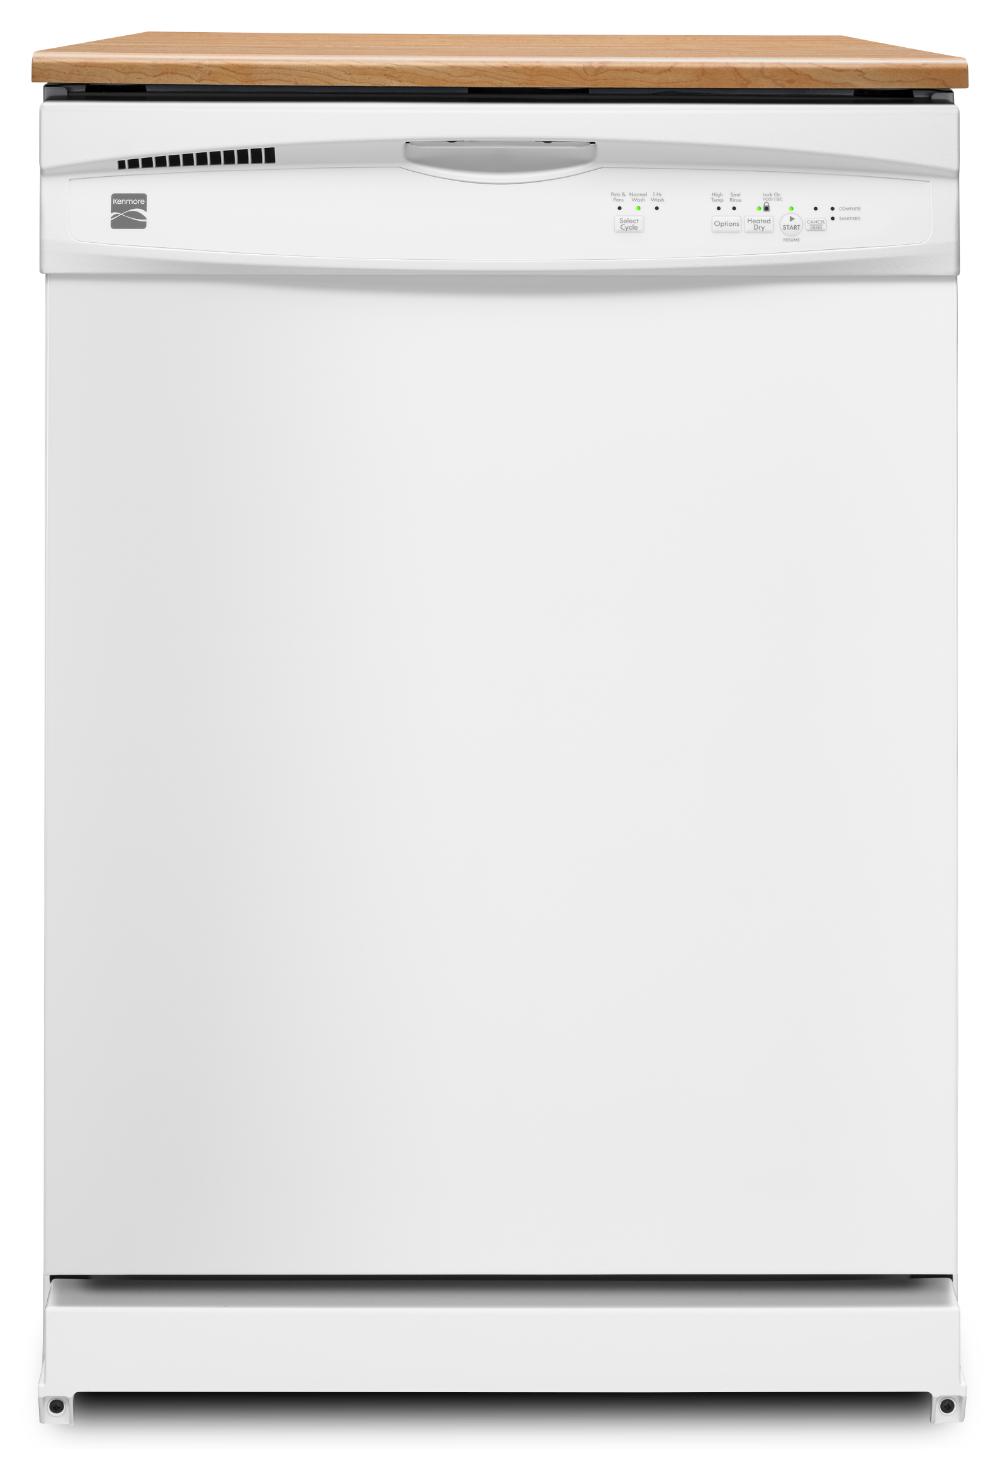 The Kenmore White 24 Portable Dishwasher Makes Makes Chore Free